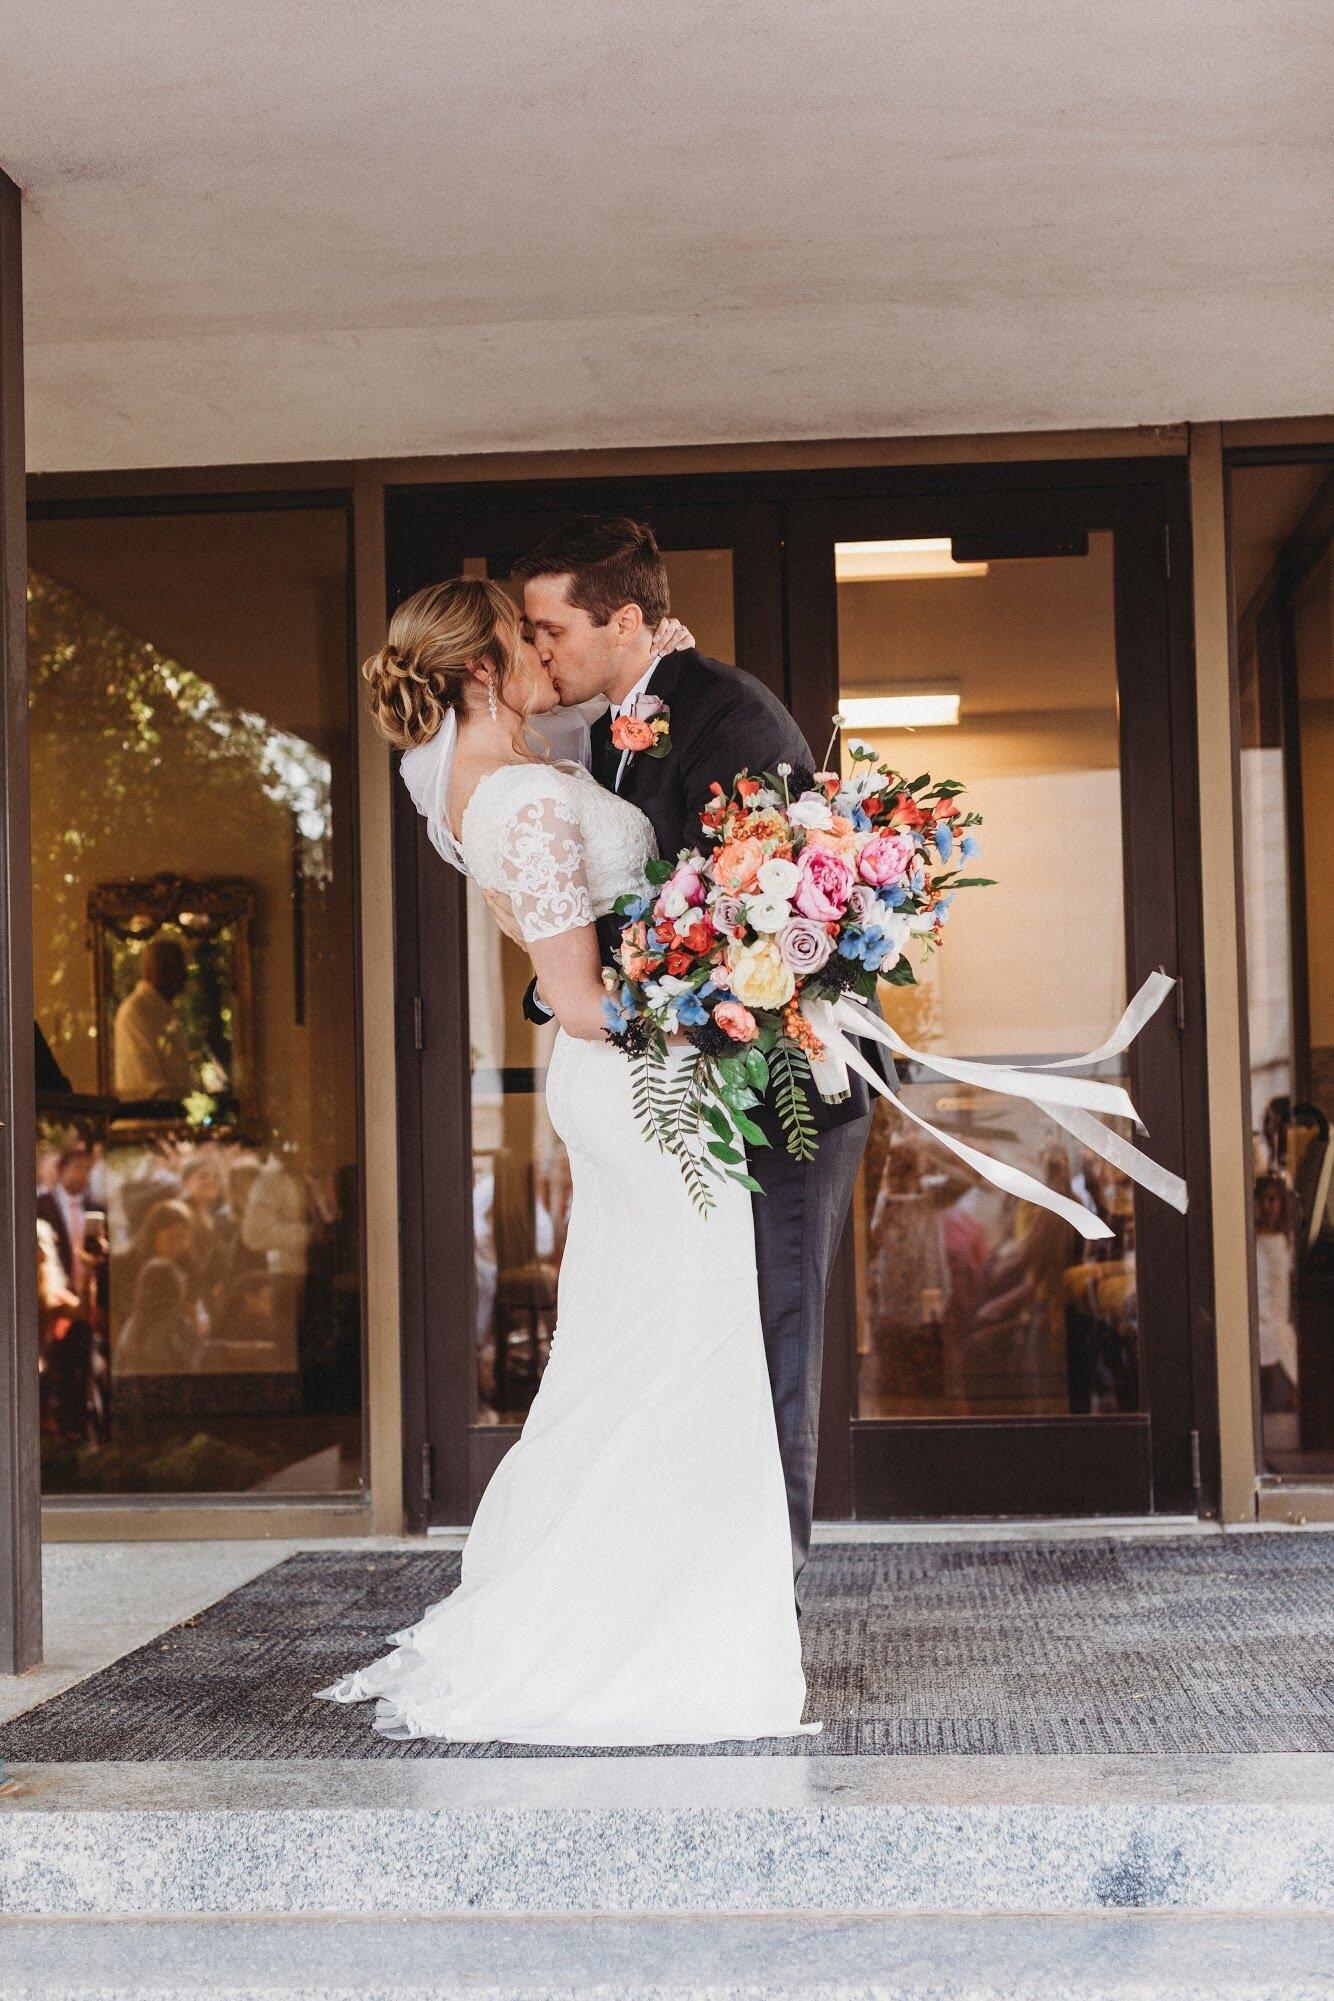 Mauve Order Silk Wedding Flowers Online Love Is Blooming Blog Silk Wedding Flowers And Bouquets Online Love Is Blooming